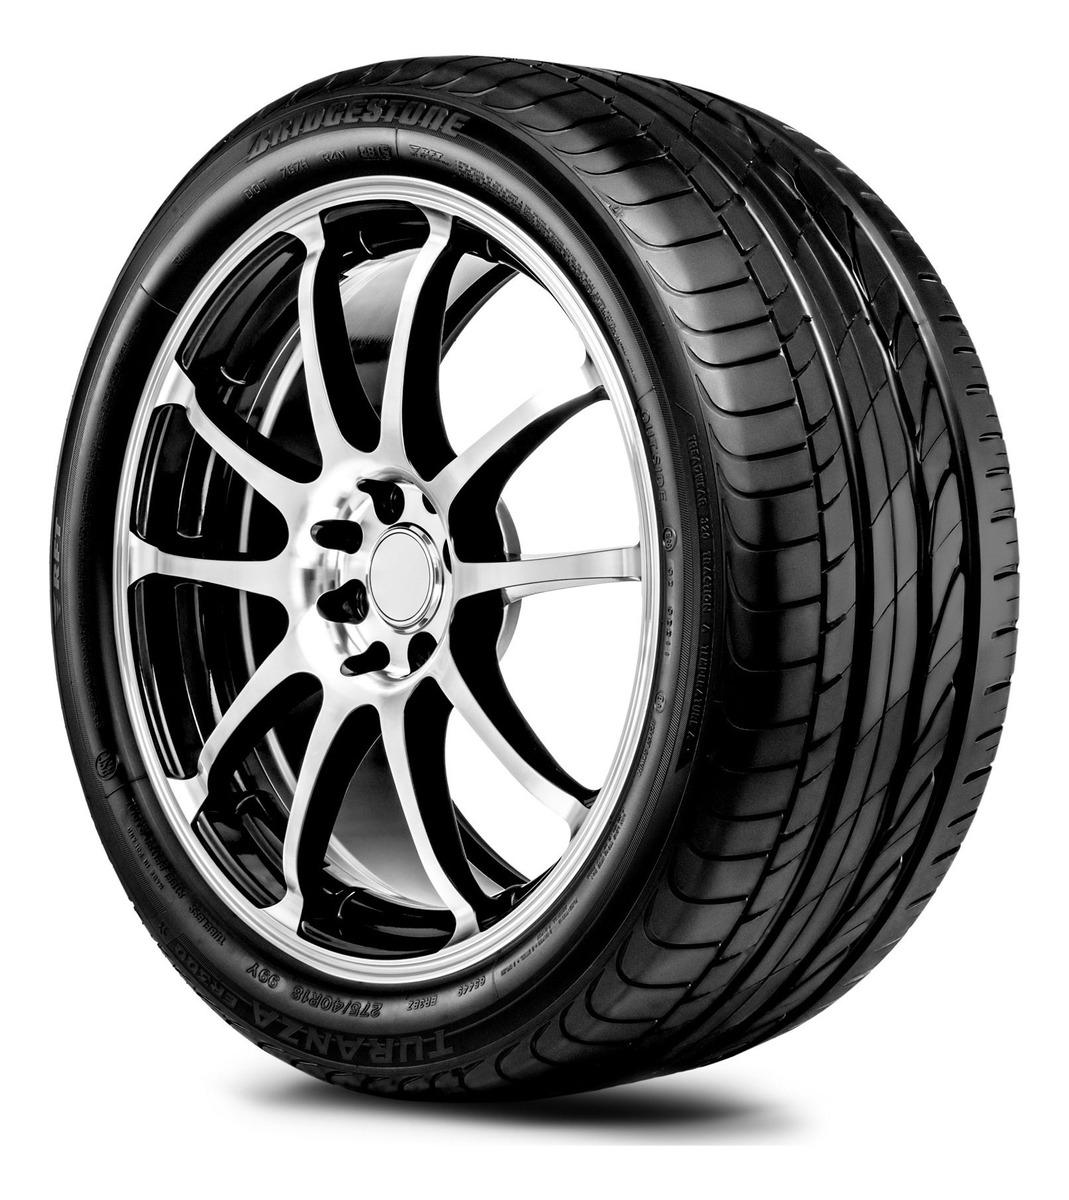 Neumáticos 225/45R17 94W TURANZA ER300 BRIDGESTONE